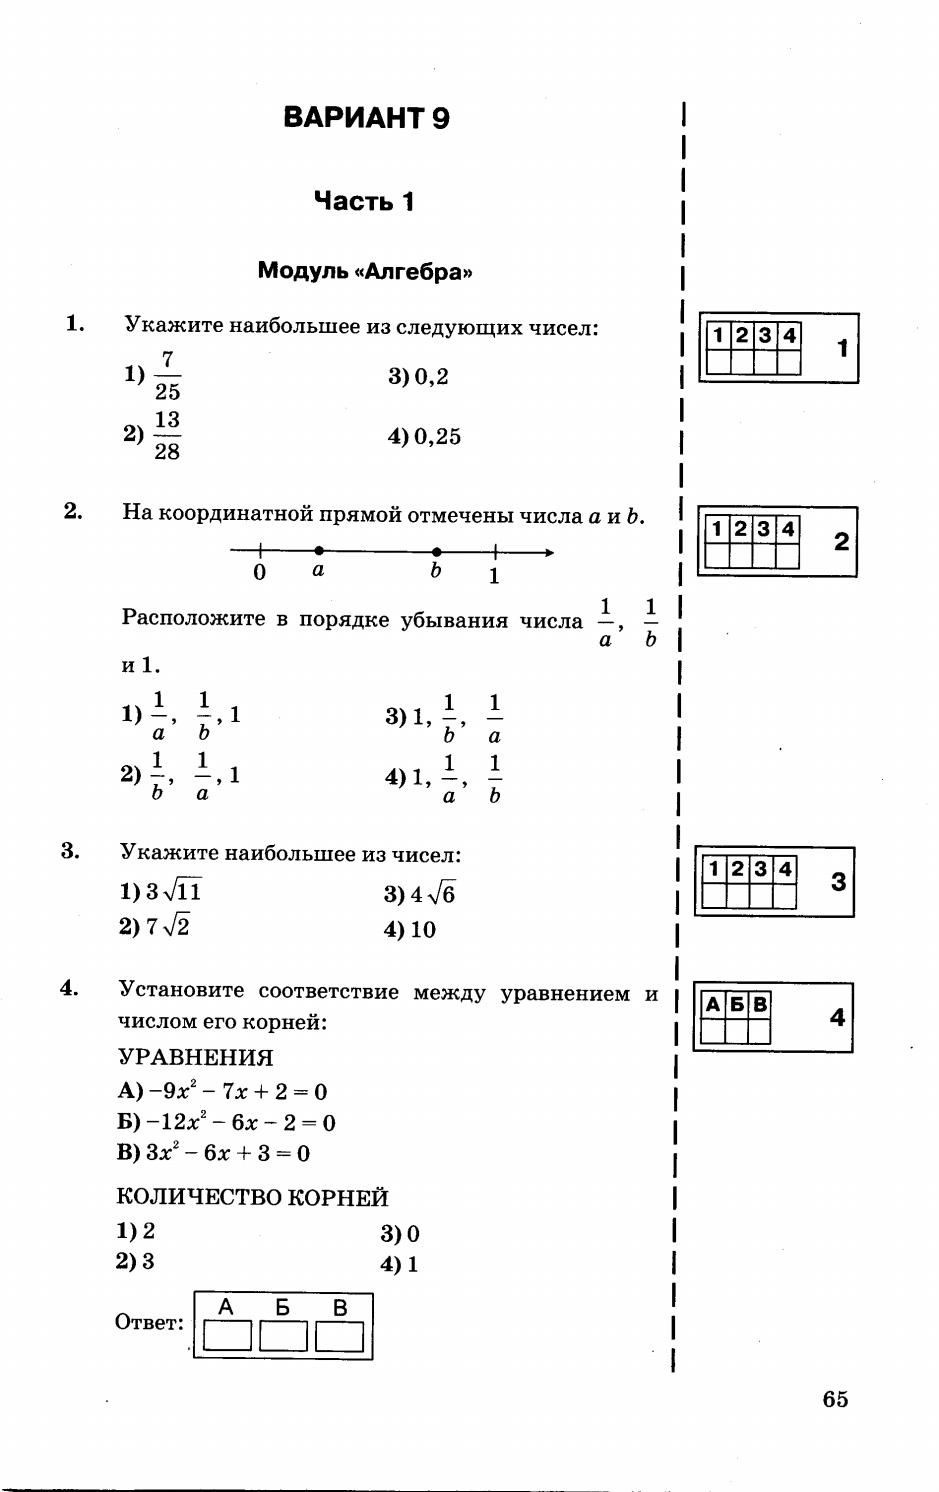 https://docs.google.com/viewer?pid=explorer&srcid=0Bw_f54pvrxEtbldKNGgyaFE3TDg&chrome=false&docid=e803bf4555b2fe7a8e01072ad16bc93b%7Cc9acad21277b9c8c76d1236b5bcea6e2&a=bi&pagenumber=66&w=939